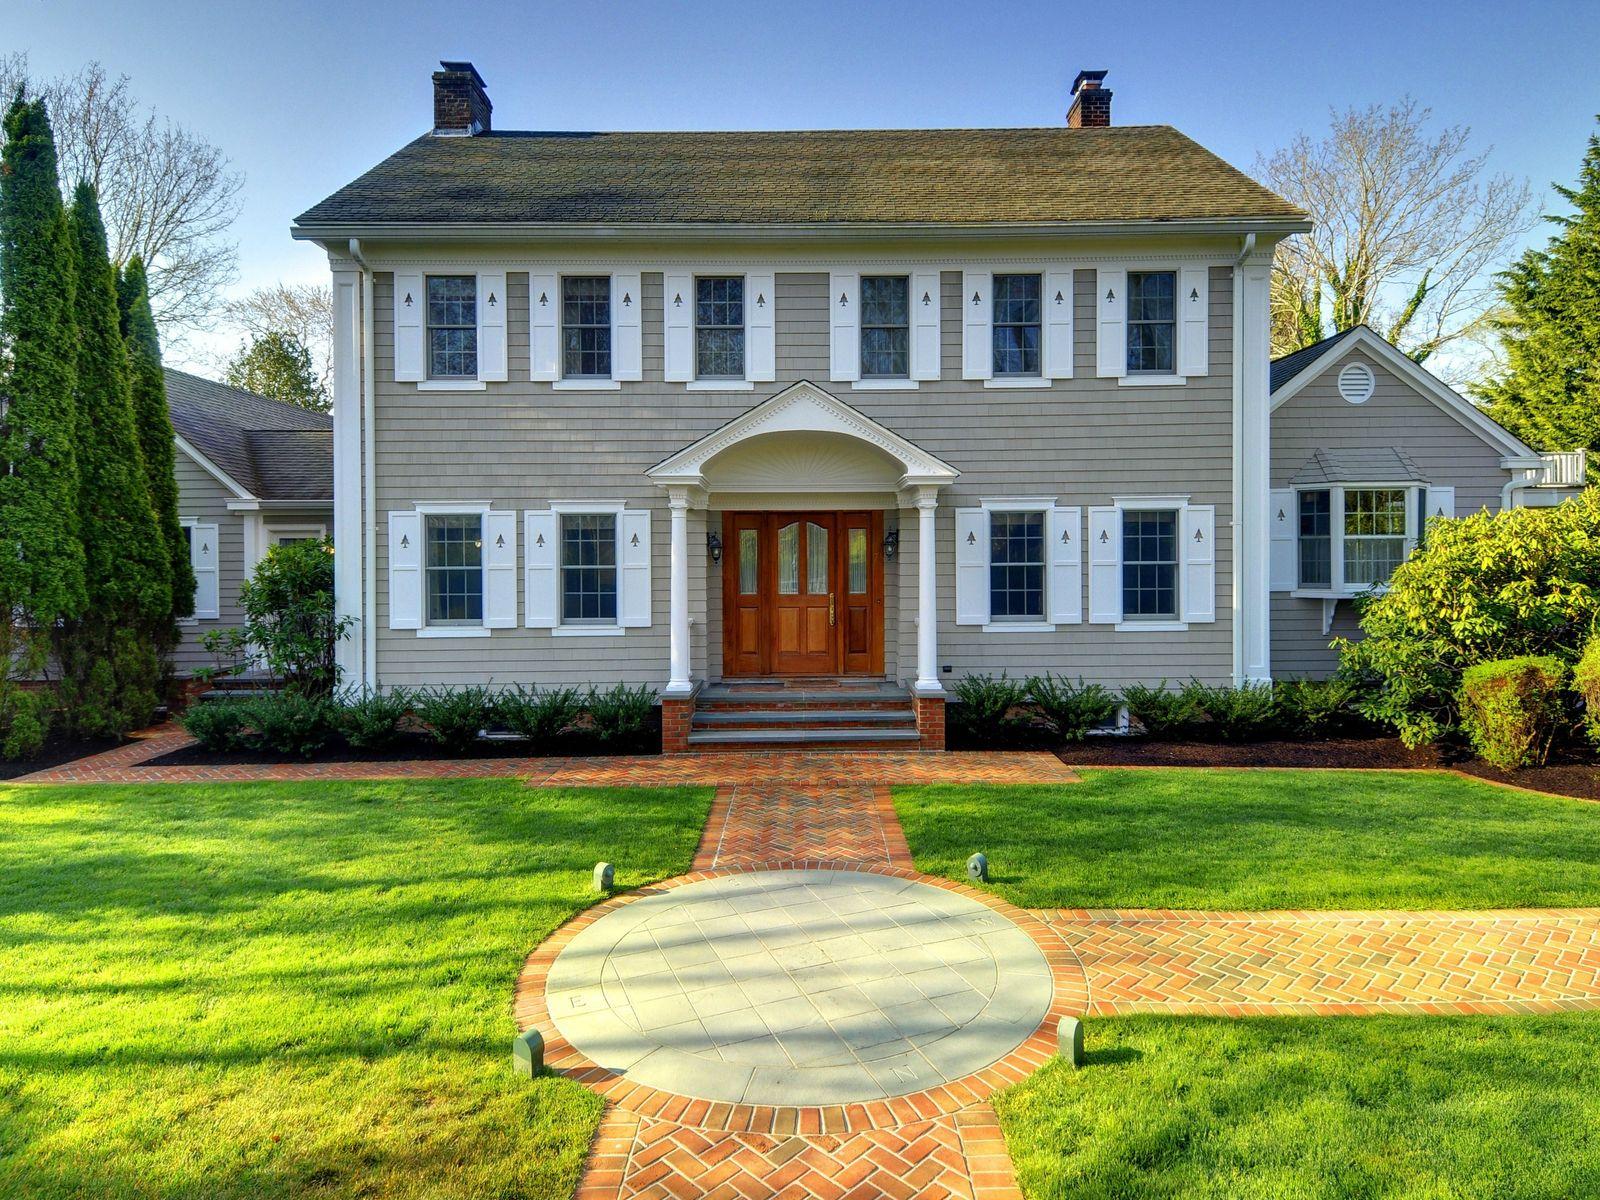 East hampton village east hampton ny single family home for Hamptons beach house for sale